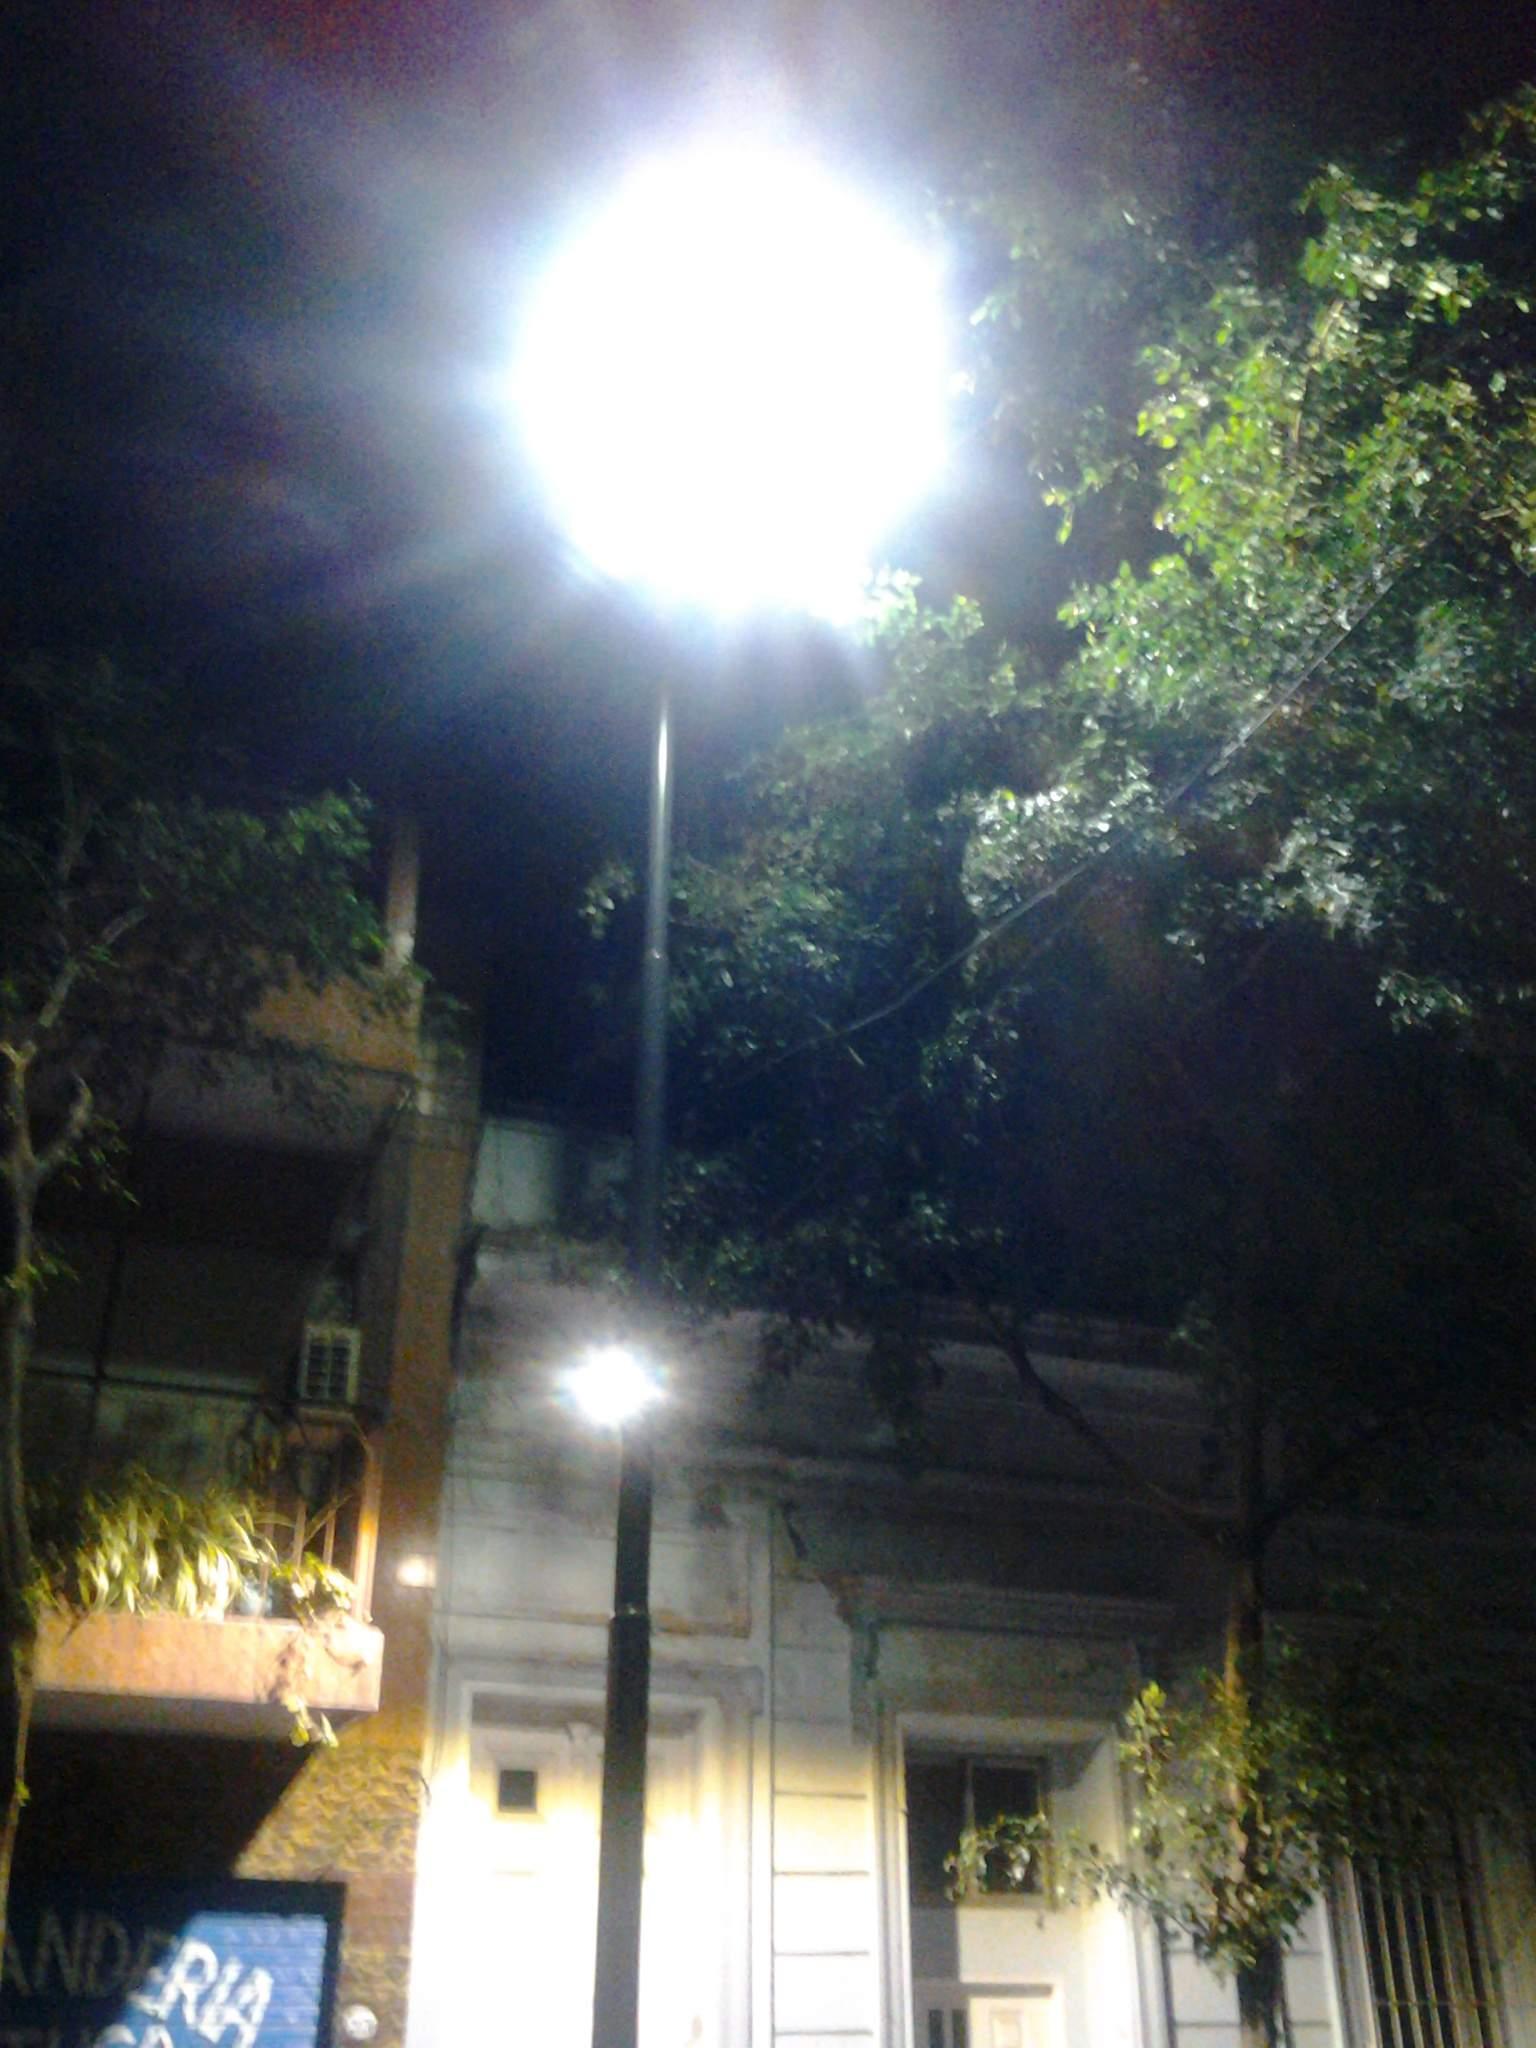 Ya hay postes con luminarias a dos alturas diferentes